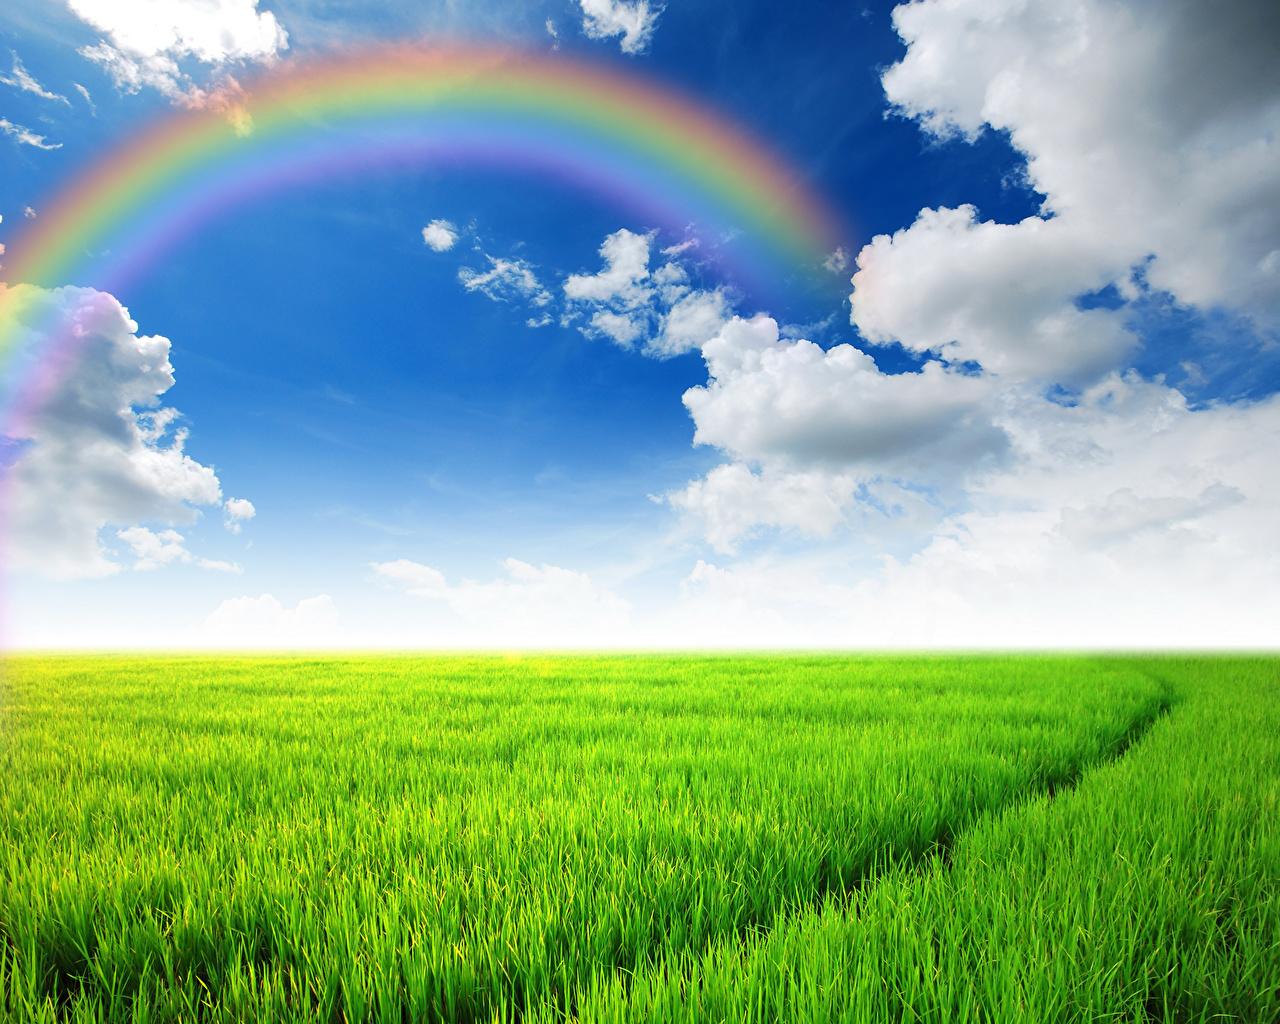 Картинка Радуга Природа Небо Поля Пейзаж Трава Облака